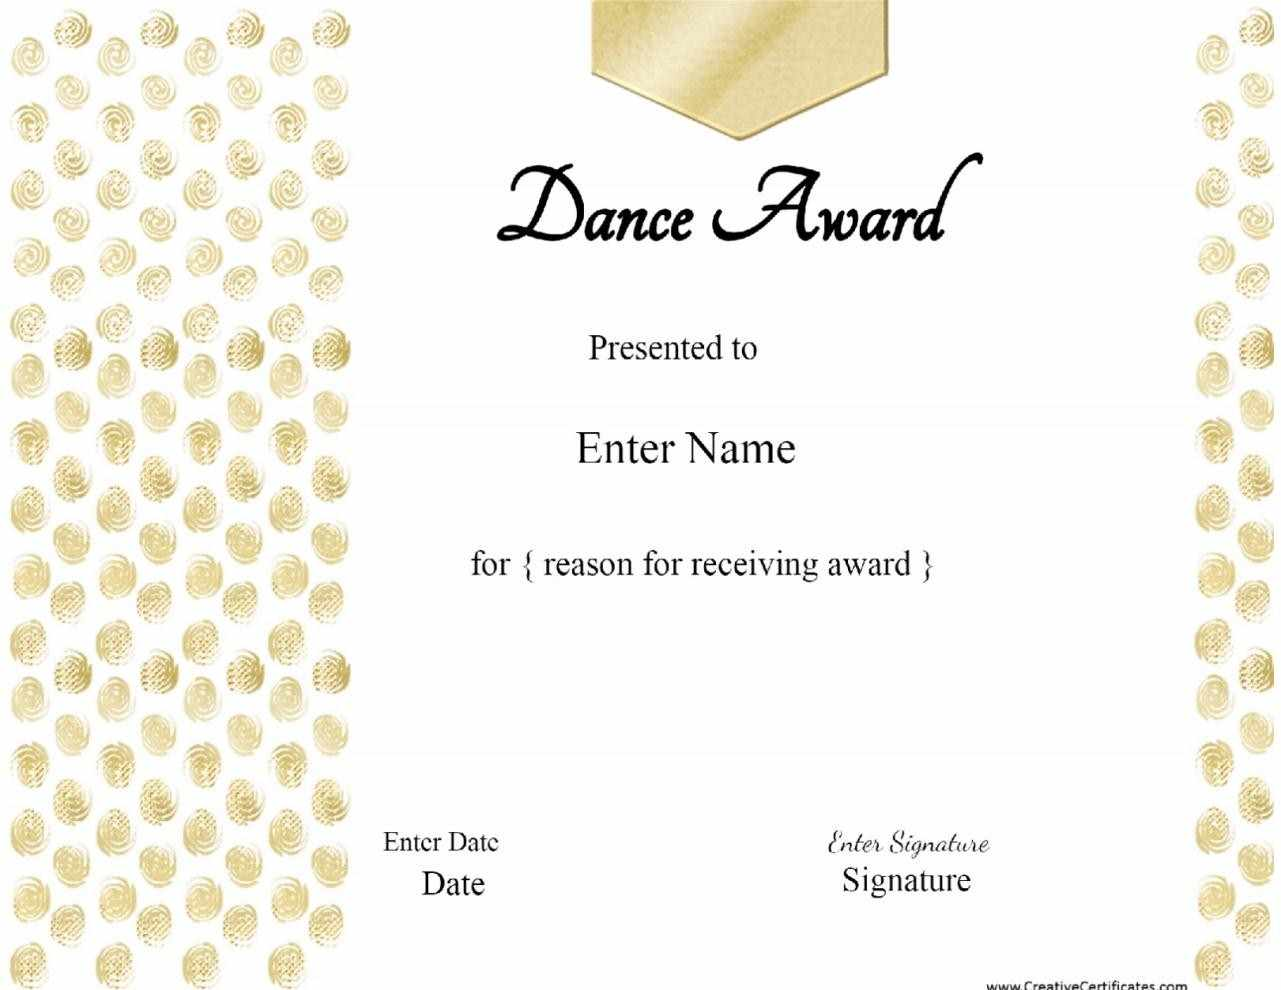 Dance award certificate etamemibawa dance award certificate yadclub Image collections